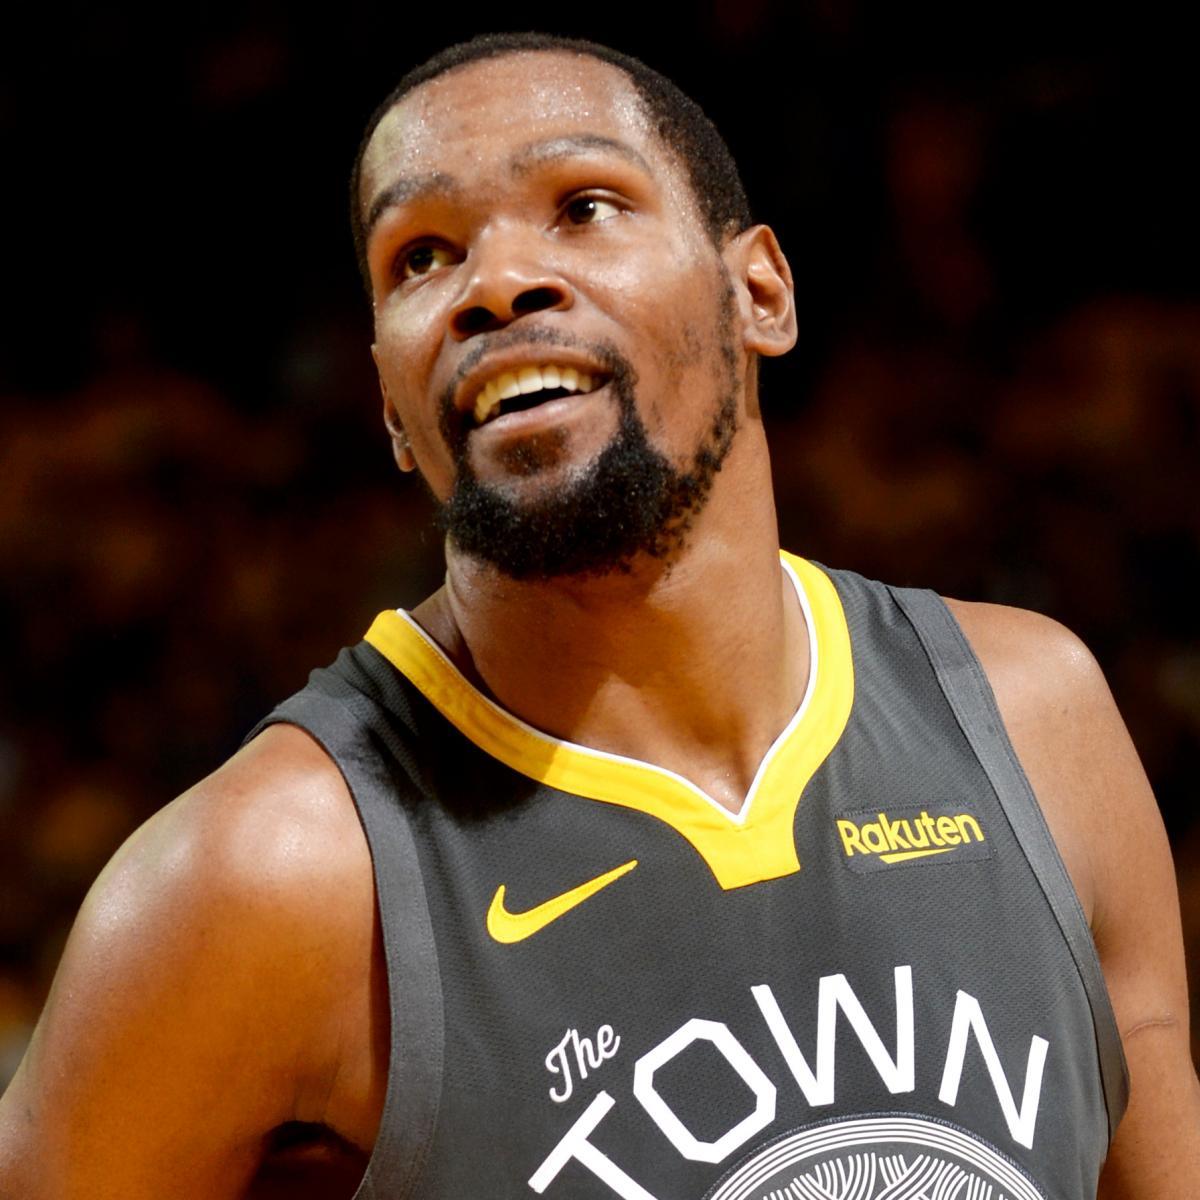 2020 NBA Championship Odds: Knicks Among Contenders Ahead